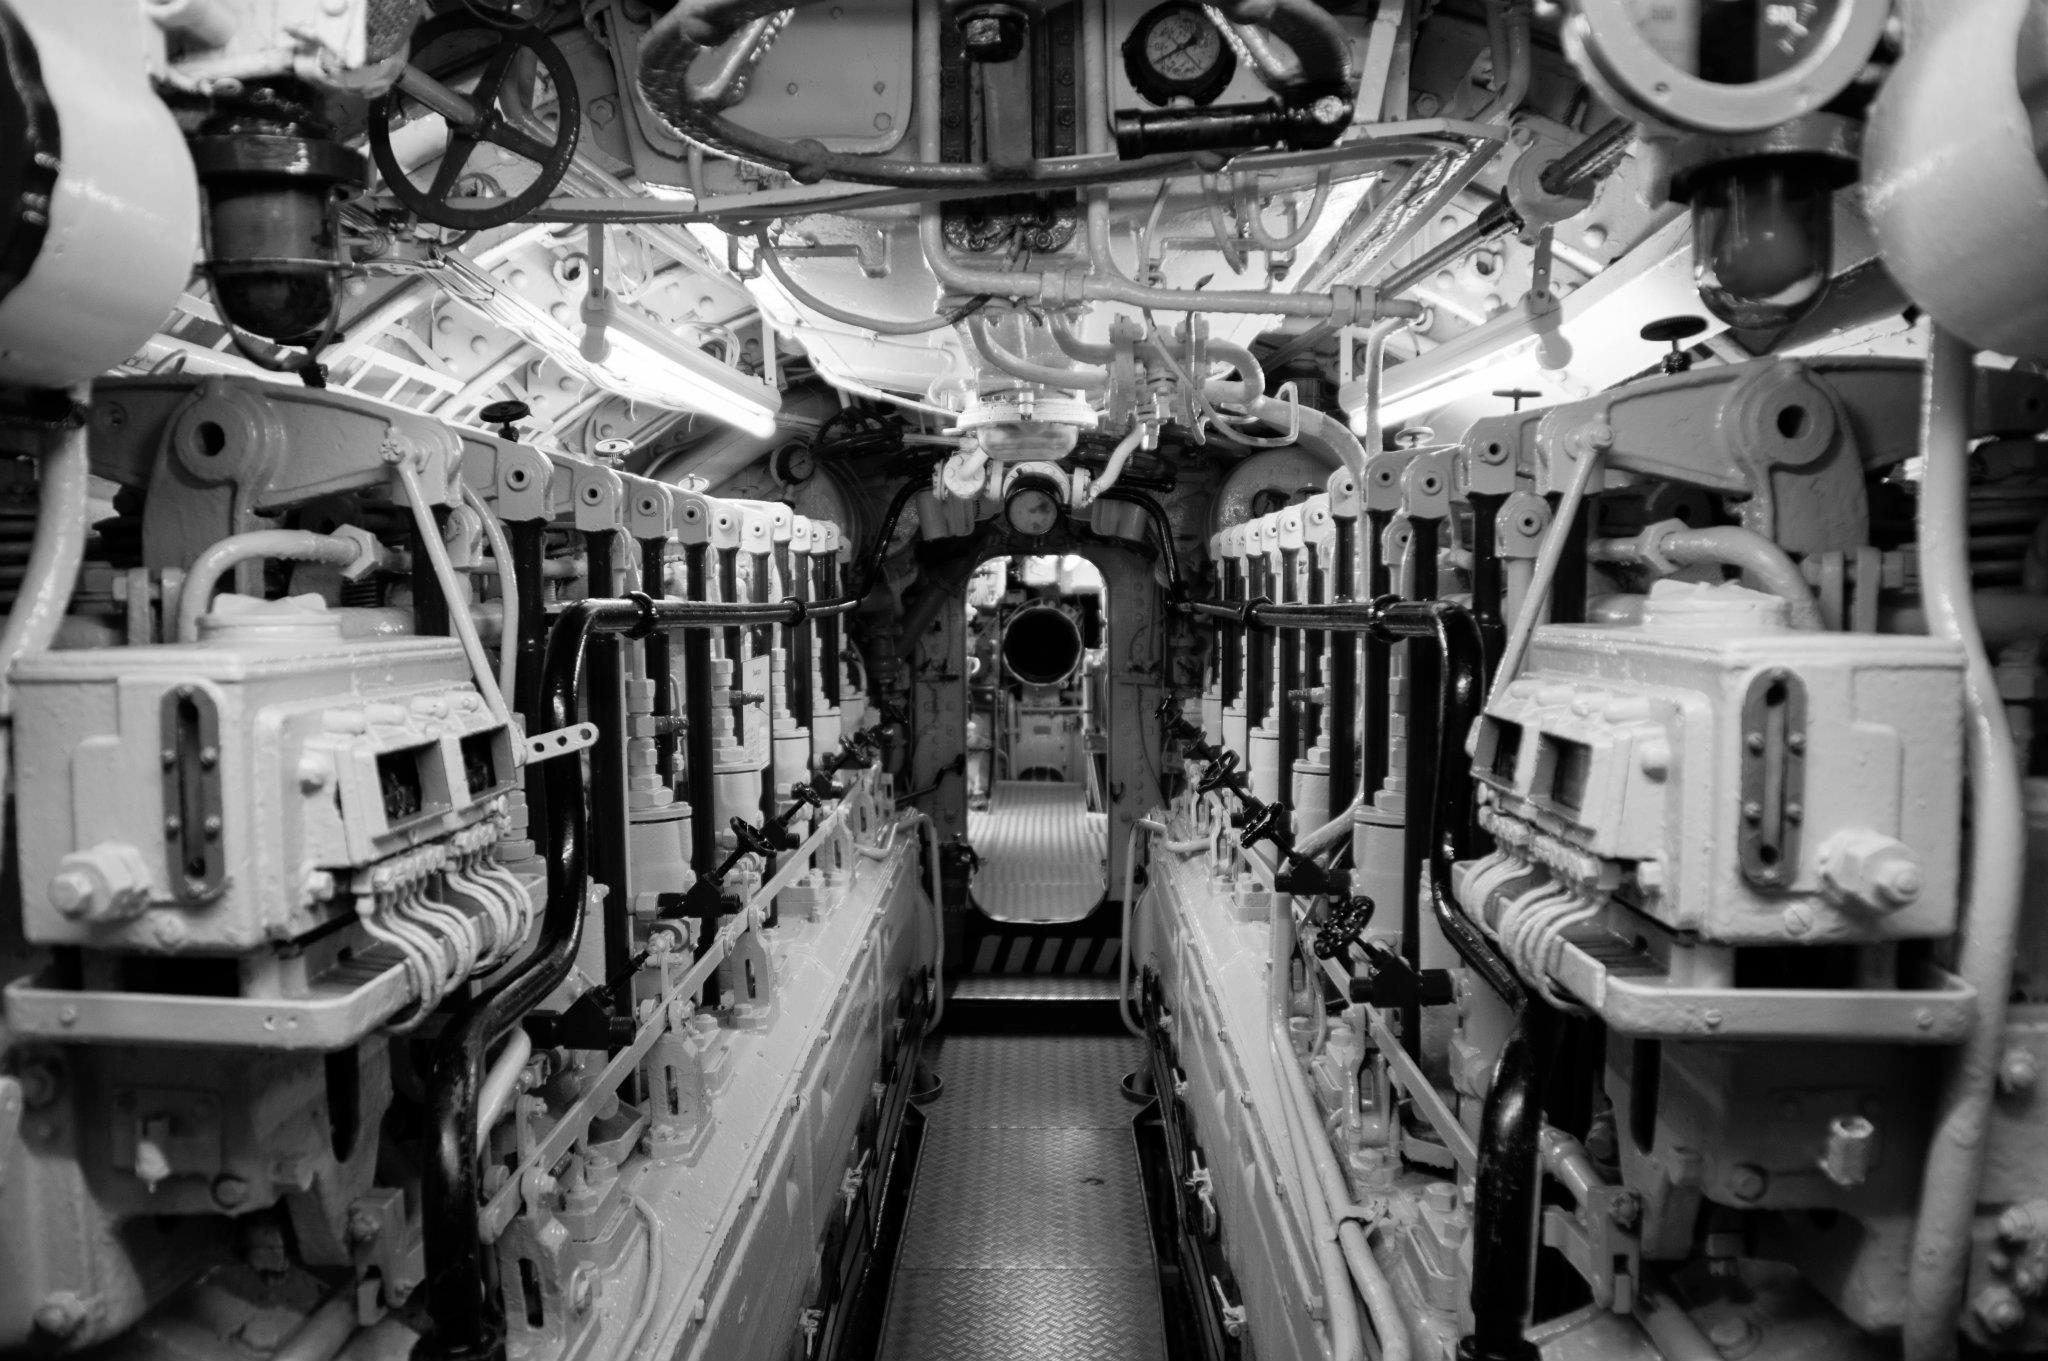 Inside submarine U-995 Type VIIC at the Laboe Naval Memorial, Germany